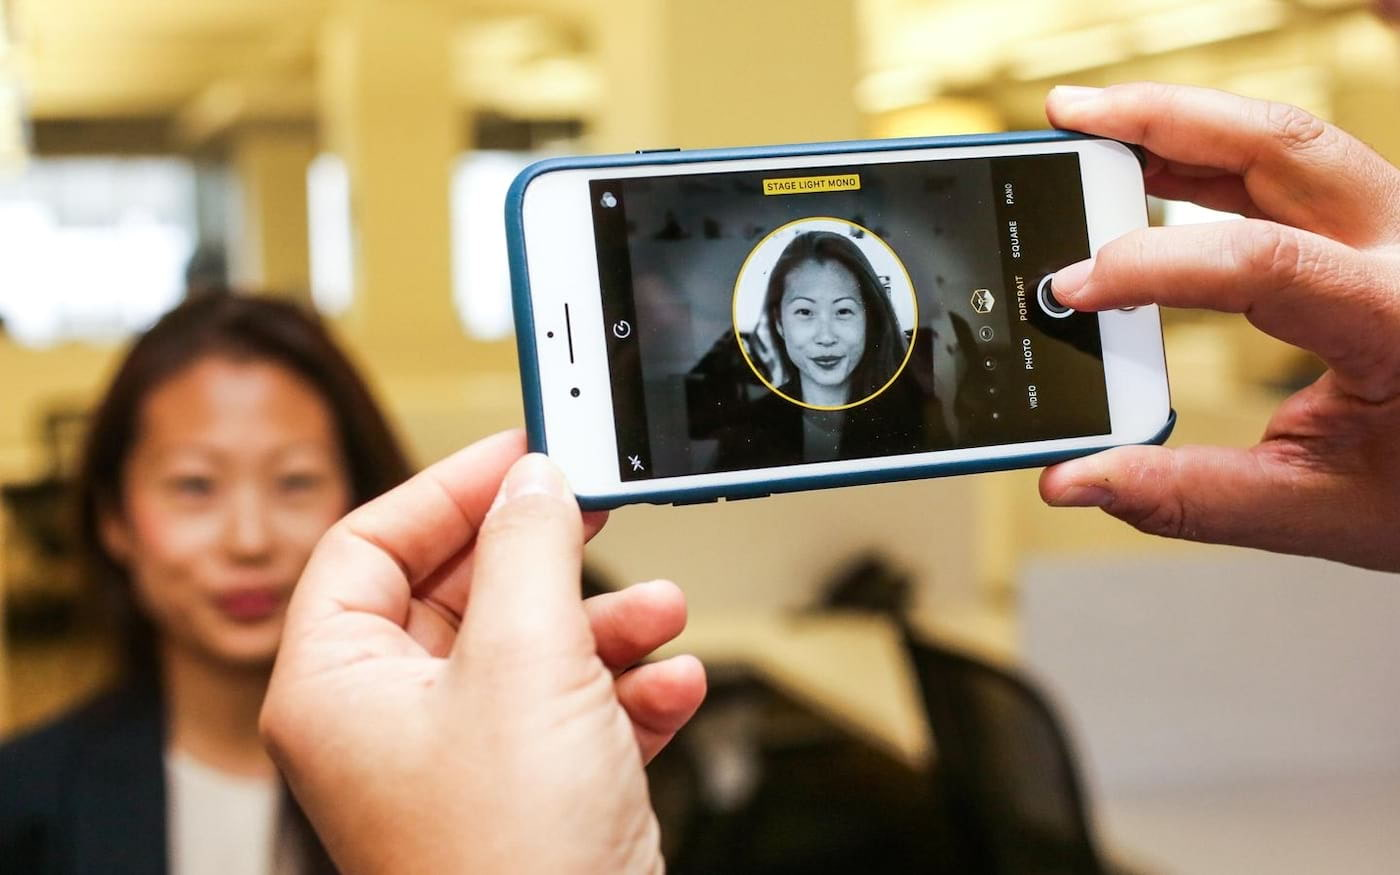 Apple lança iOS 12.3.2 para corrigir bug do Portrait Lighting no iPhone 8 Plus